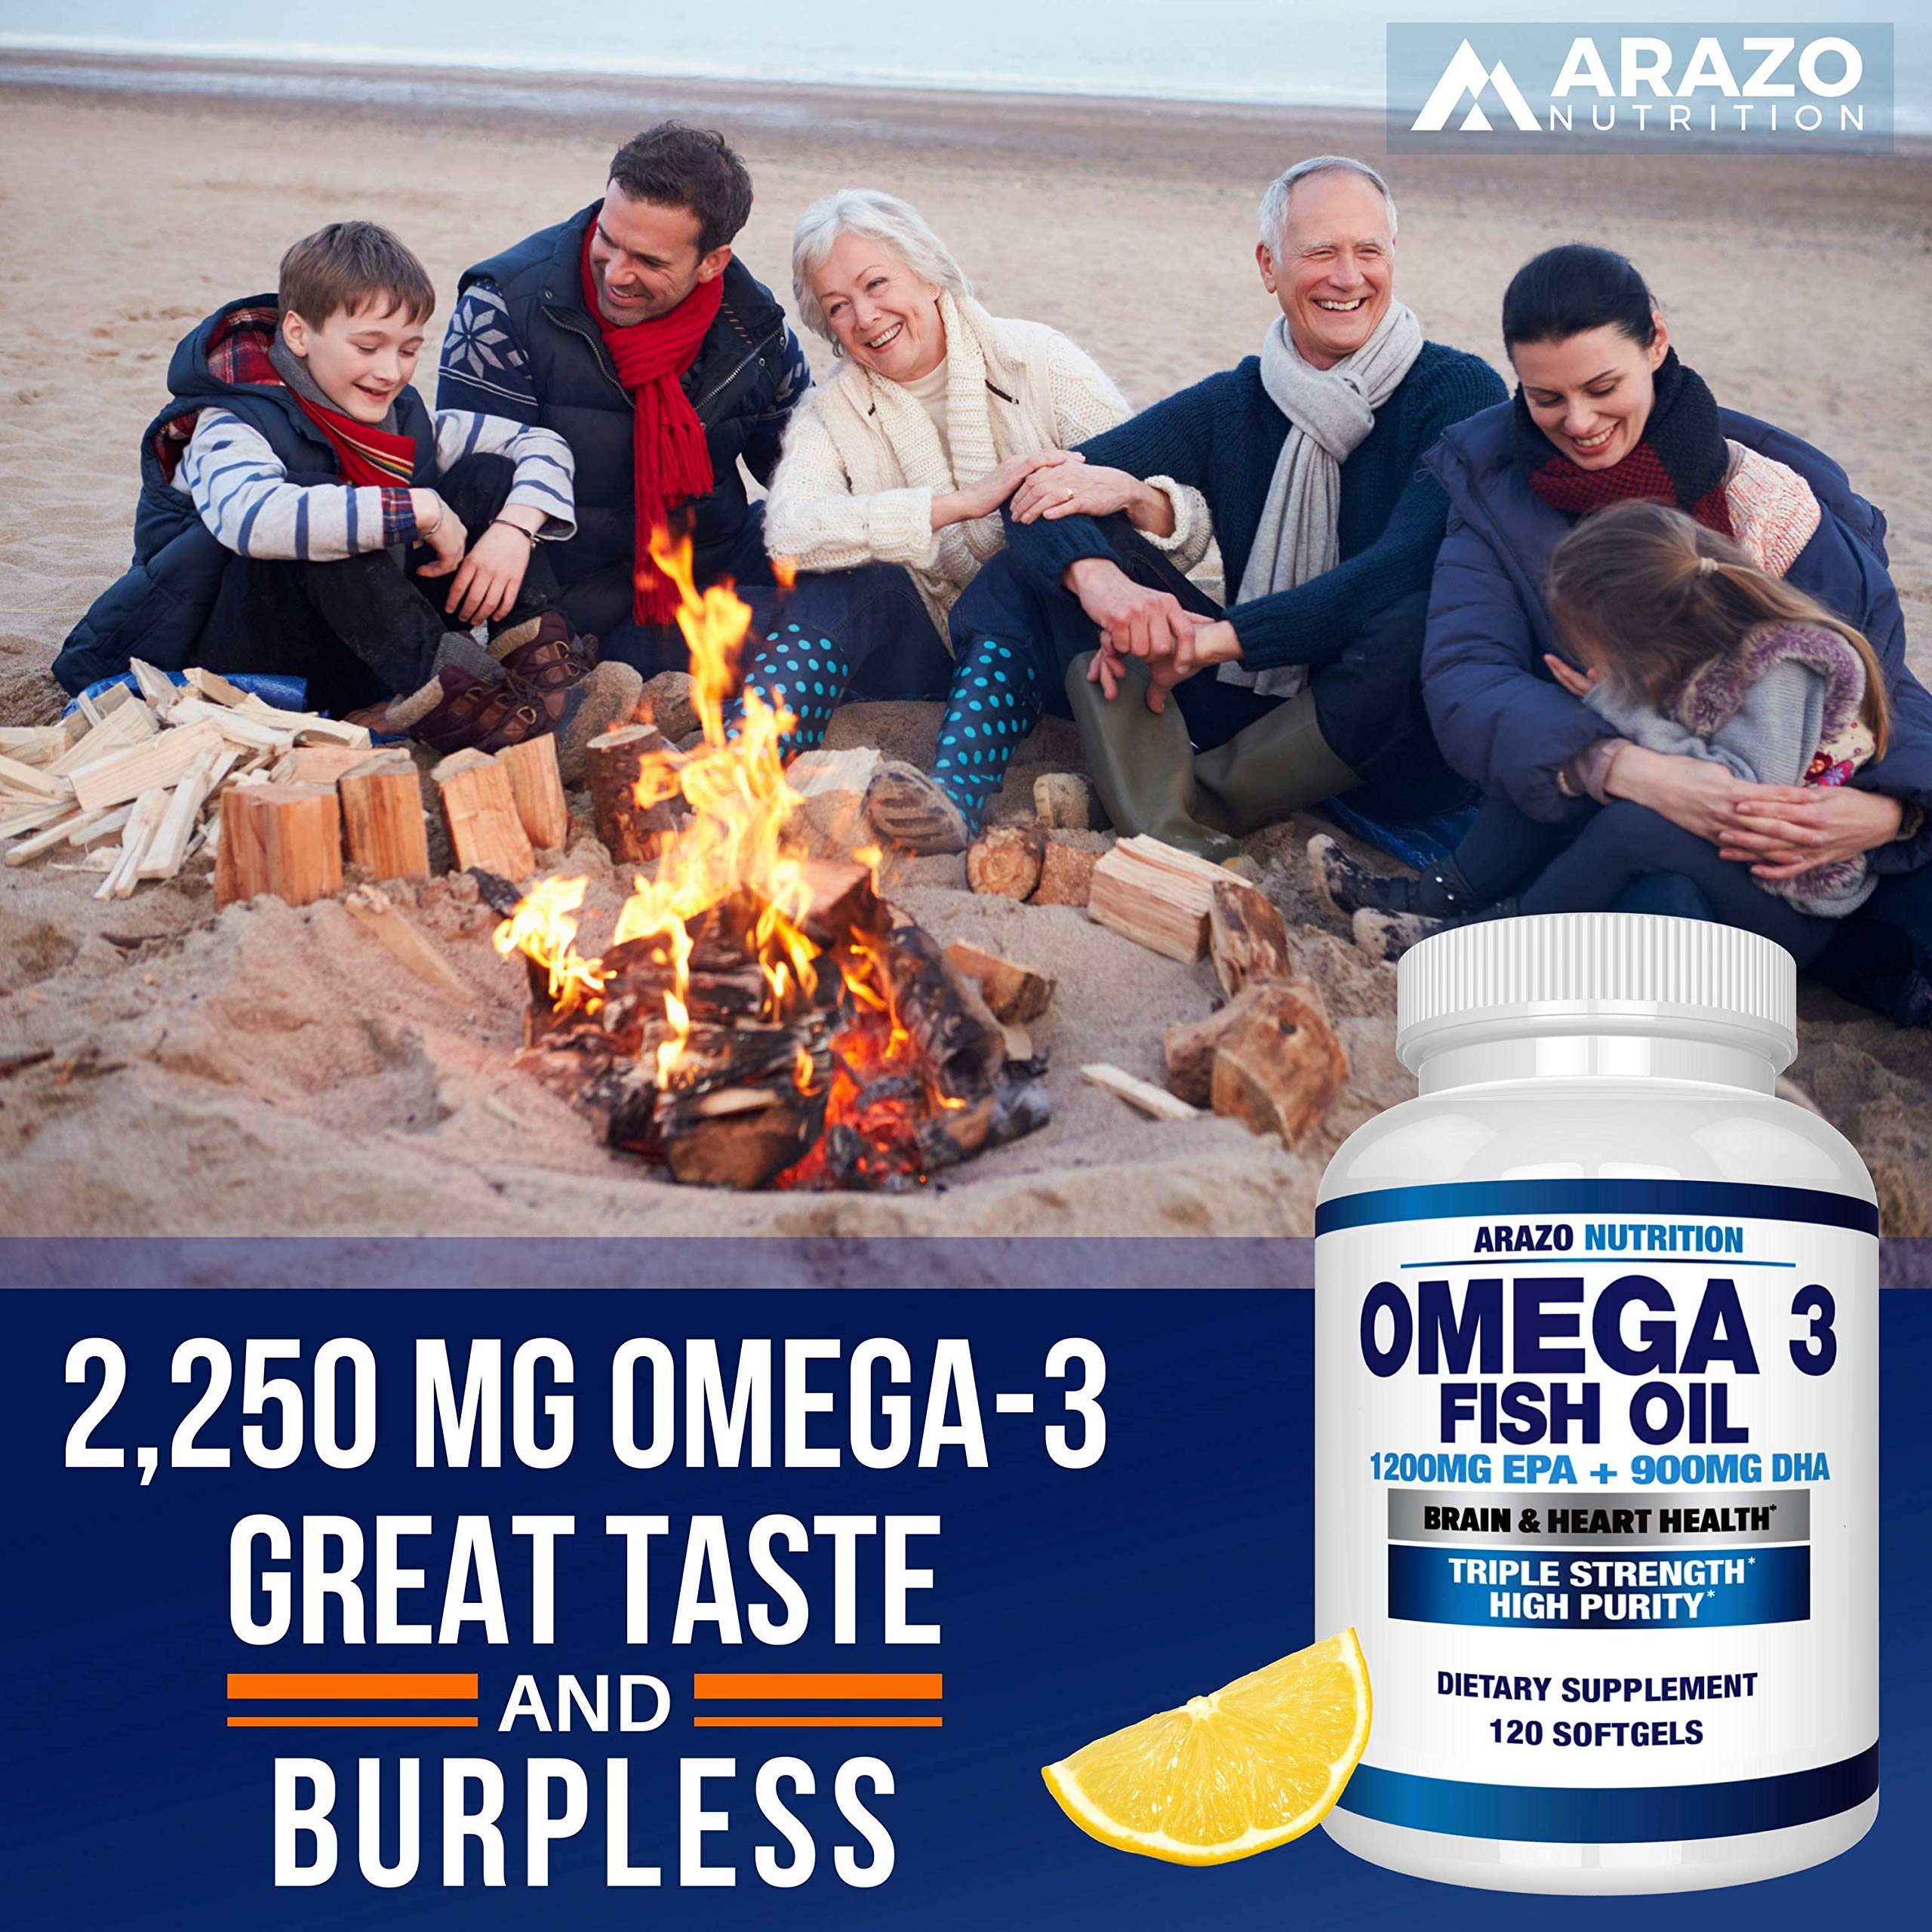 Omega 3 Fish Oil 2250mg   HIGH EPA 1200MG + DHA 900MG Triple Strength Burpless Capsules   120 Pills   Arazo Nutrition by Arazo Nutrition (Image #5)